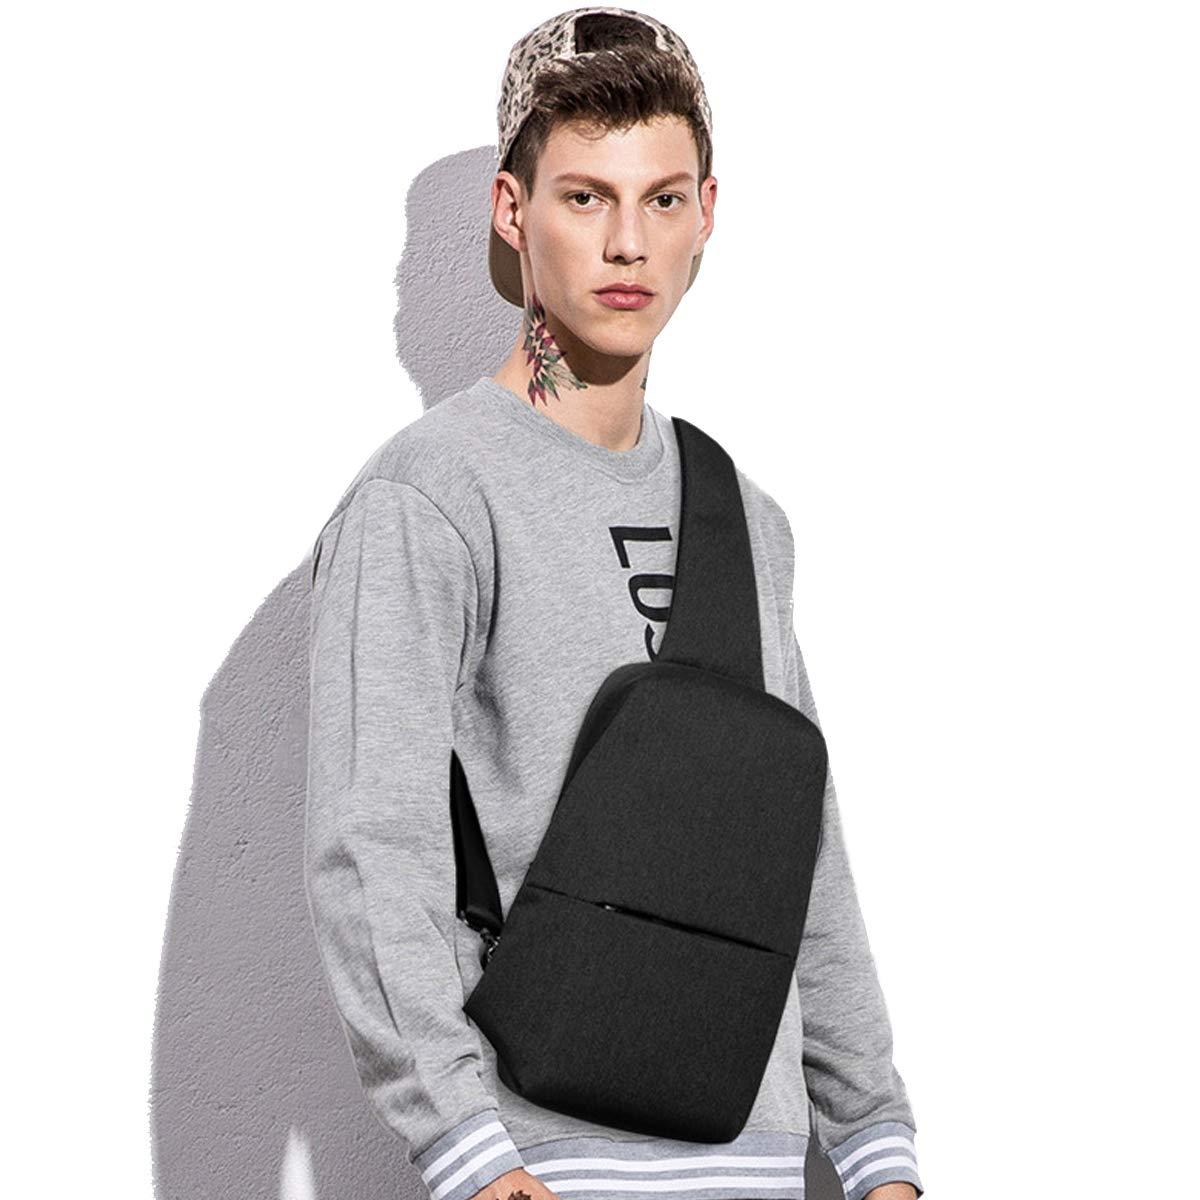 Small Sling Backpack Waterproof Sling Bag One Shoulder Crossbody Backpack Bag for Men & Women